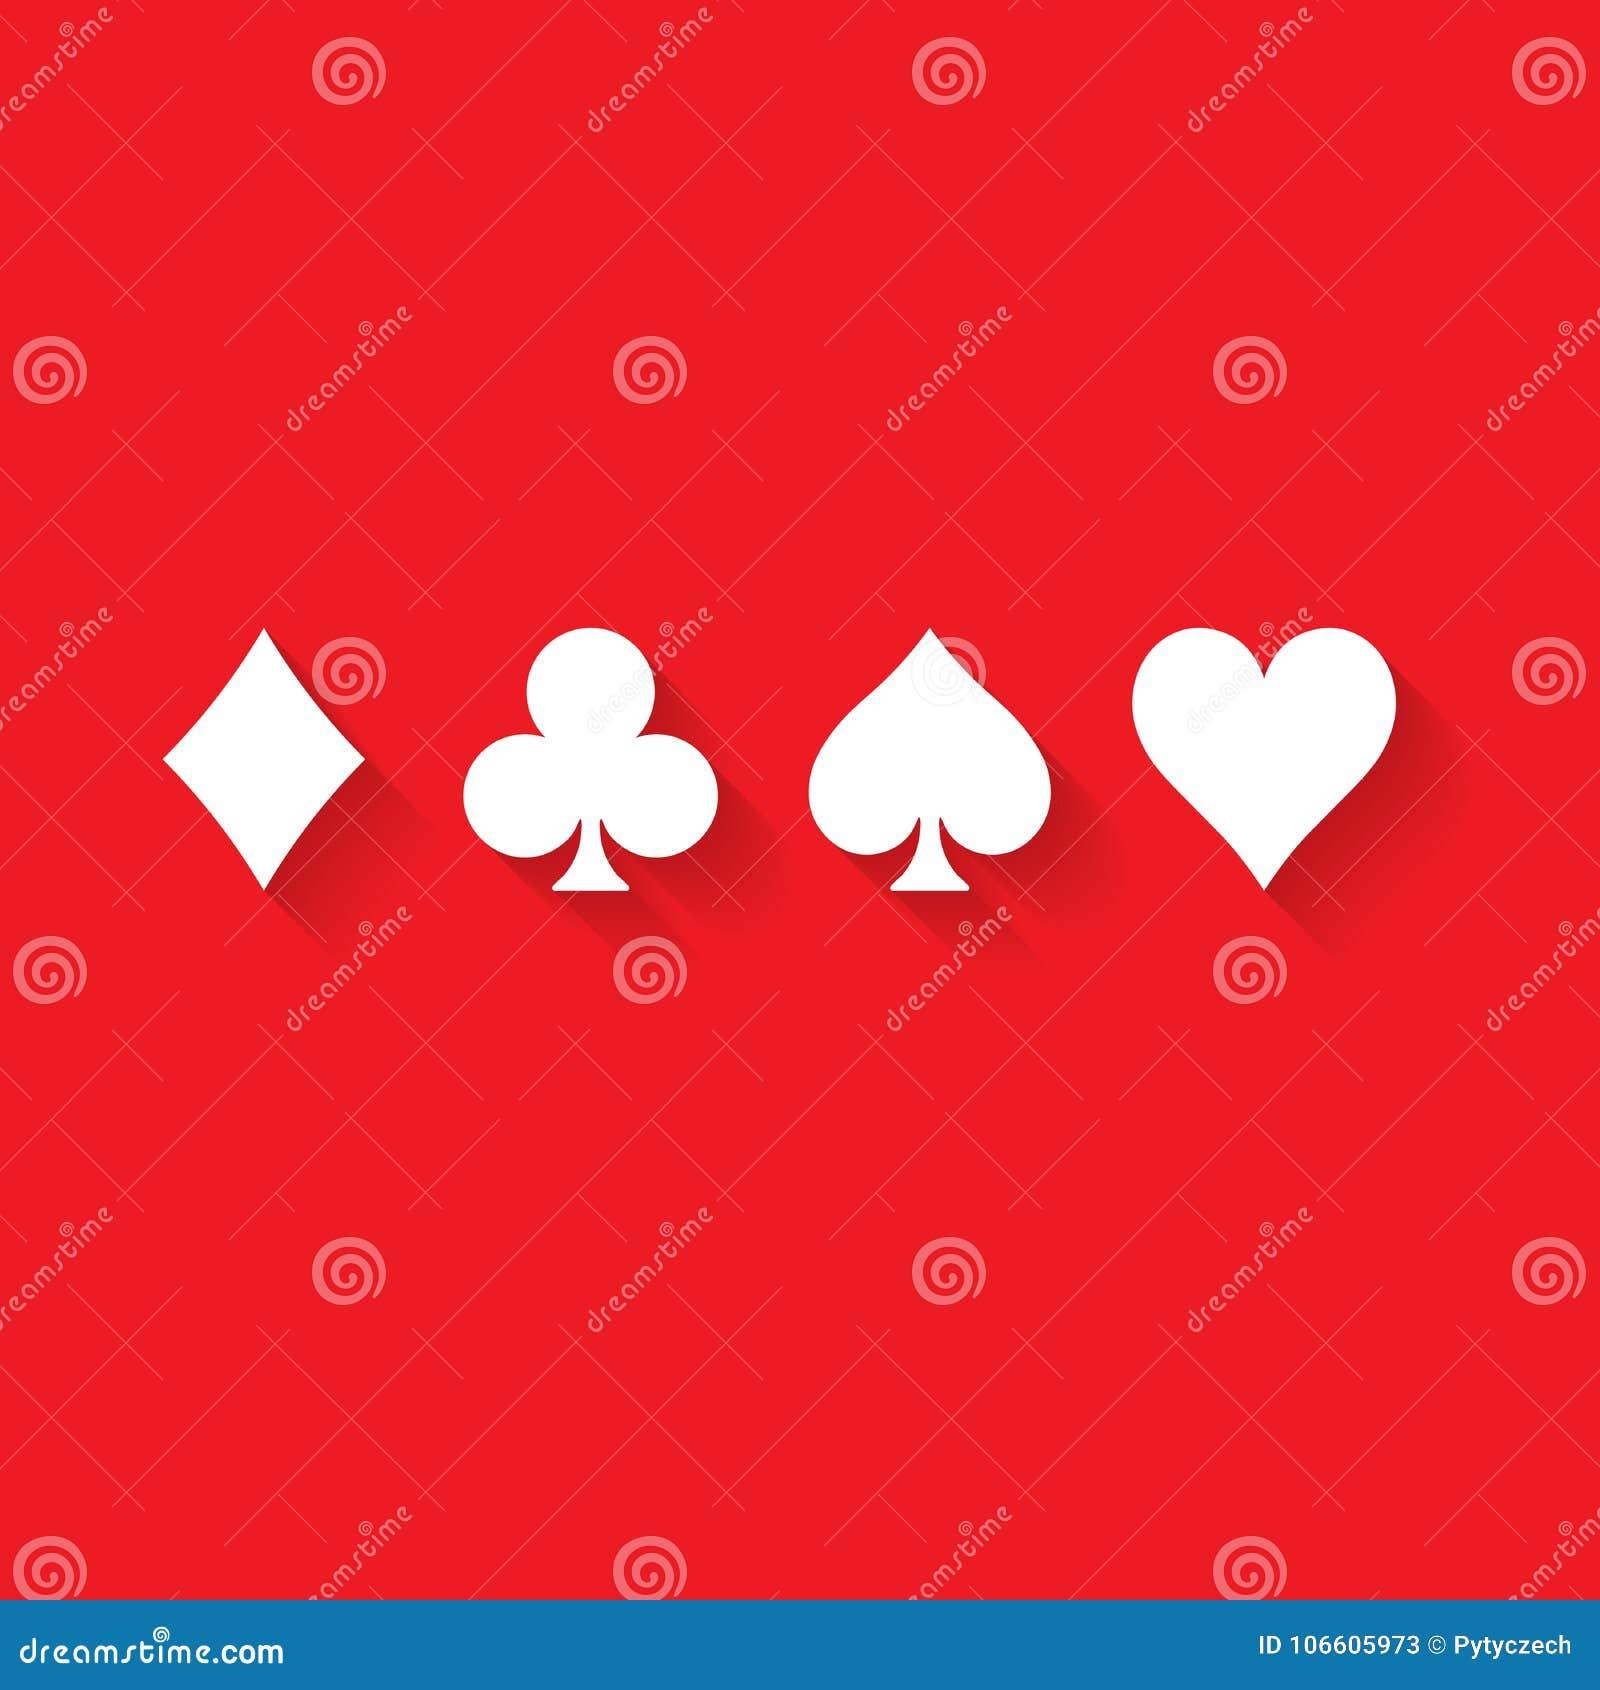 Trajes De La Tarjeta Del Póker Corazones Clubs Espadas Y